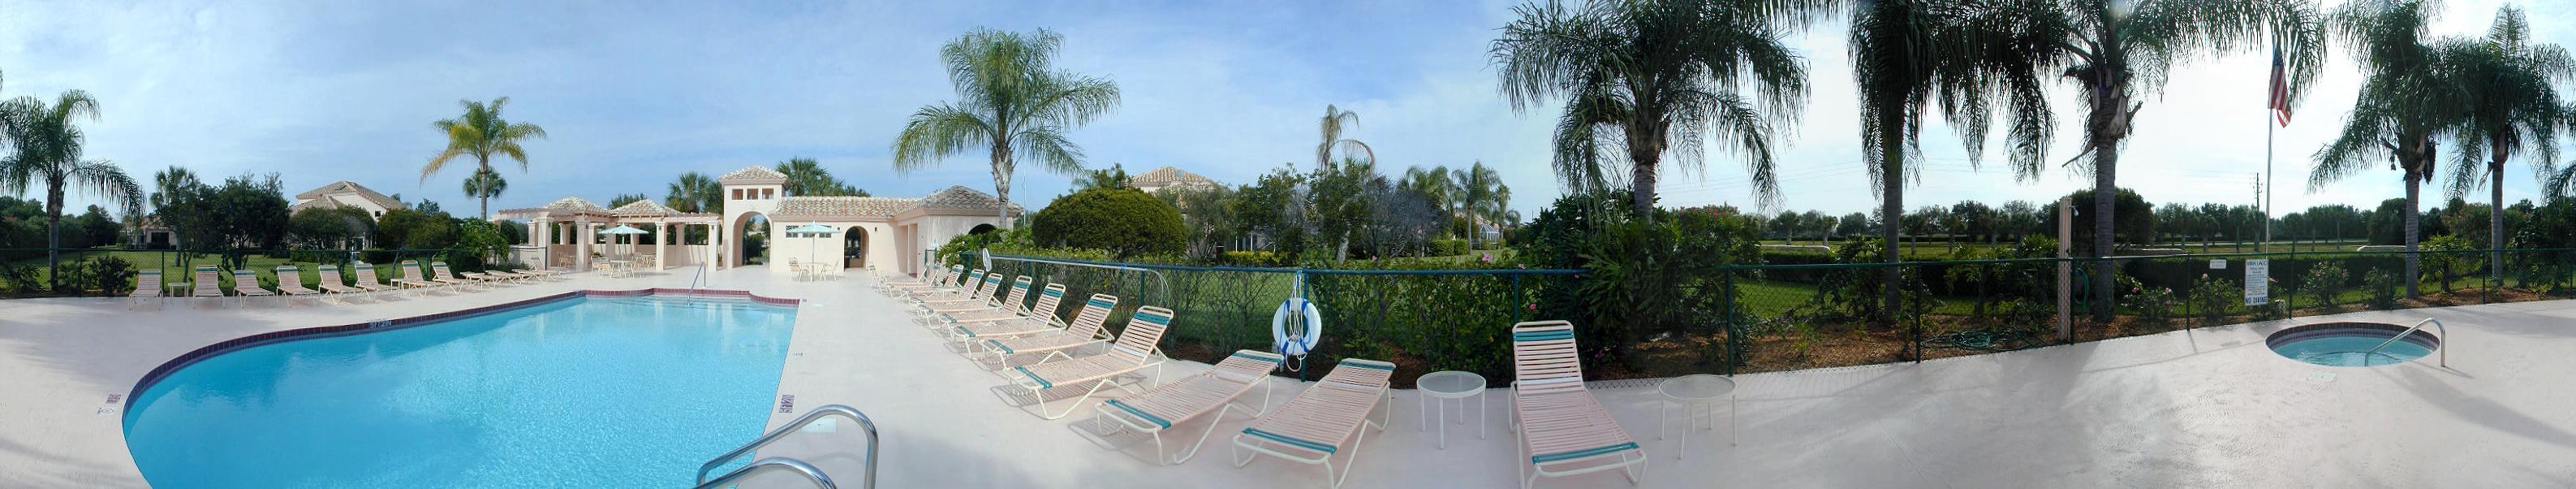 Mira Lago Homes For Sale Sarasota